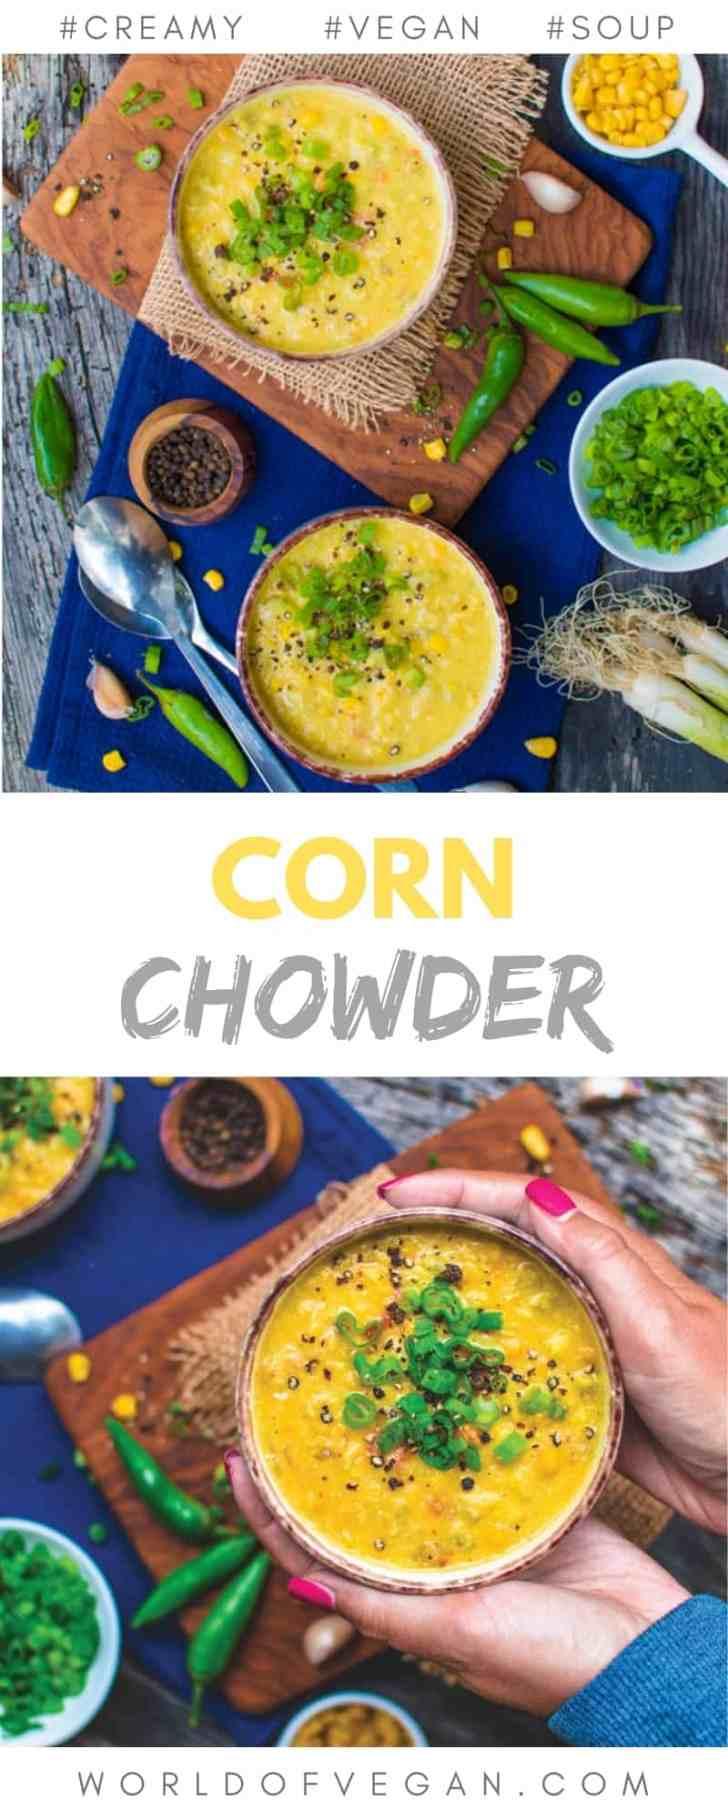 Creamy Vegan Corn Chowder PIn